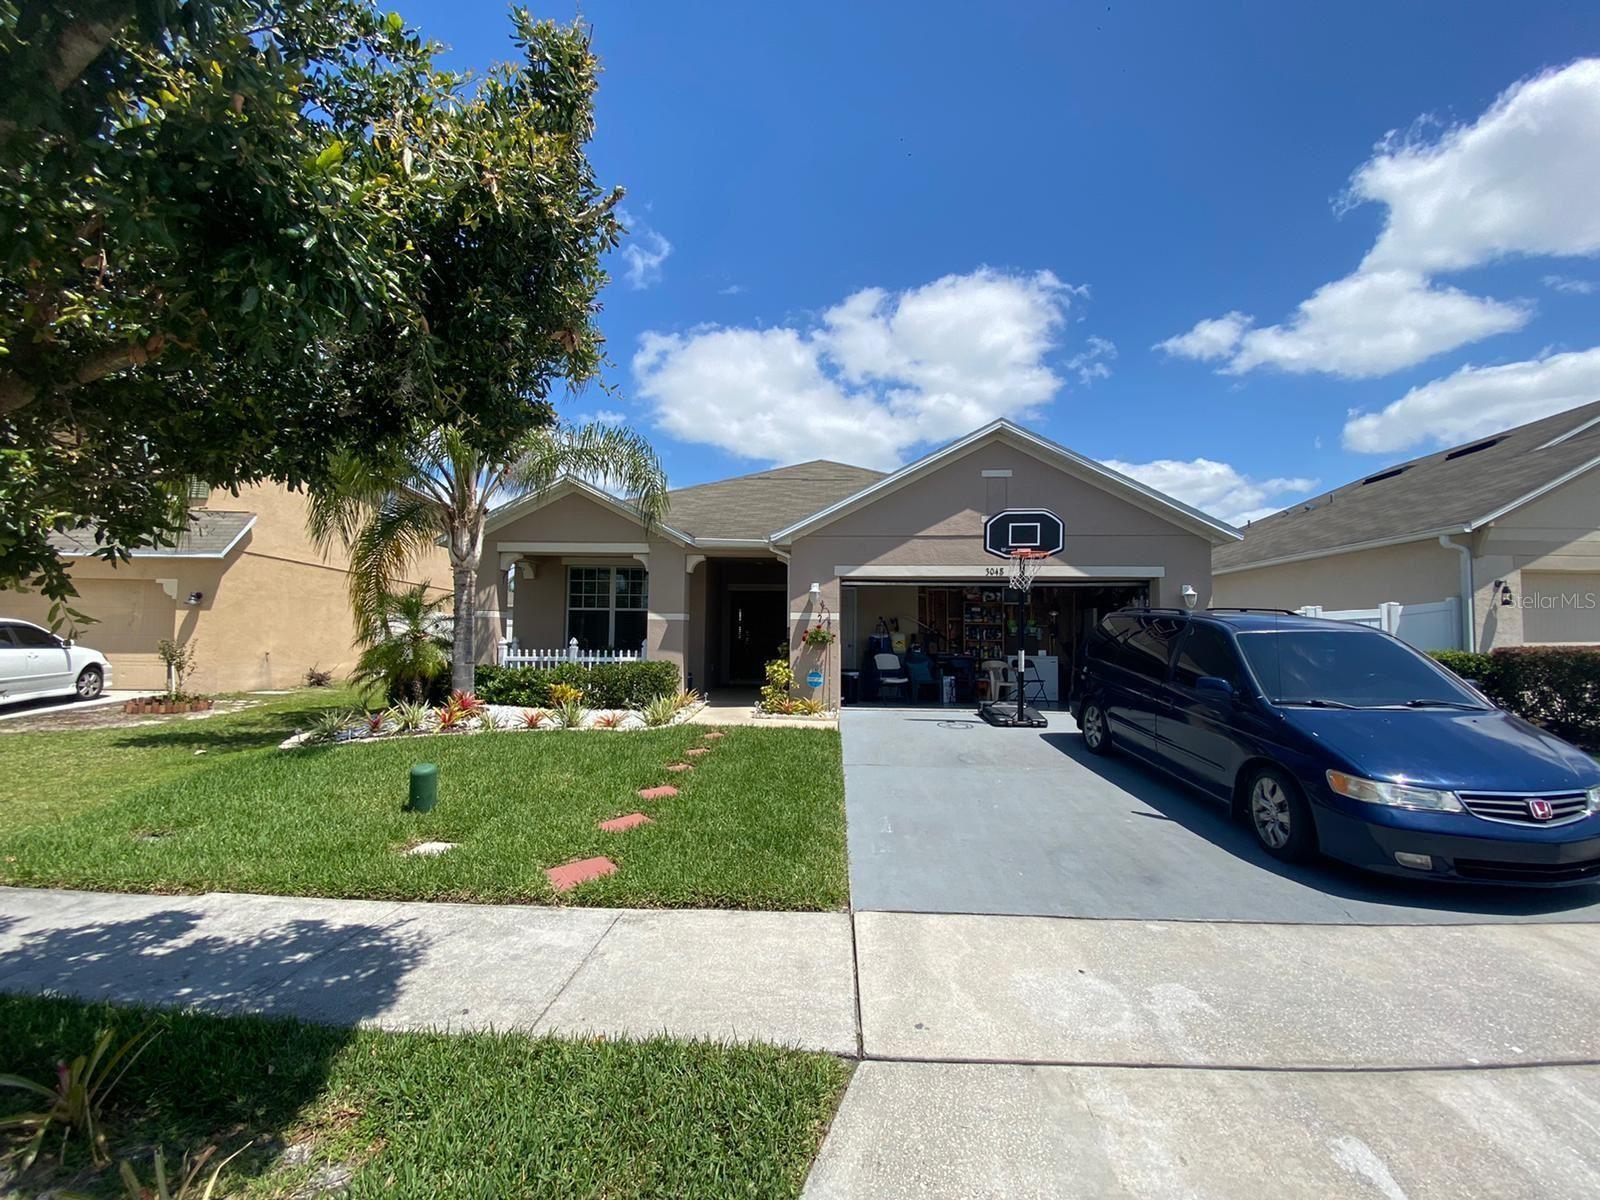 3048 CAMERON DRIVE, Kissimmee, FL 34743 - MLS#: O5961619